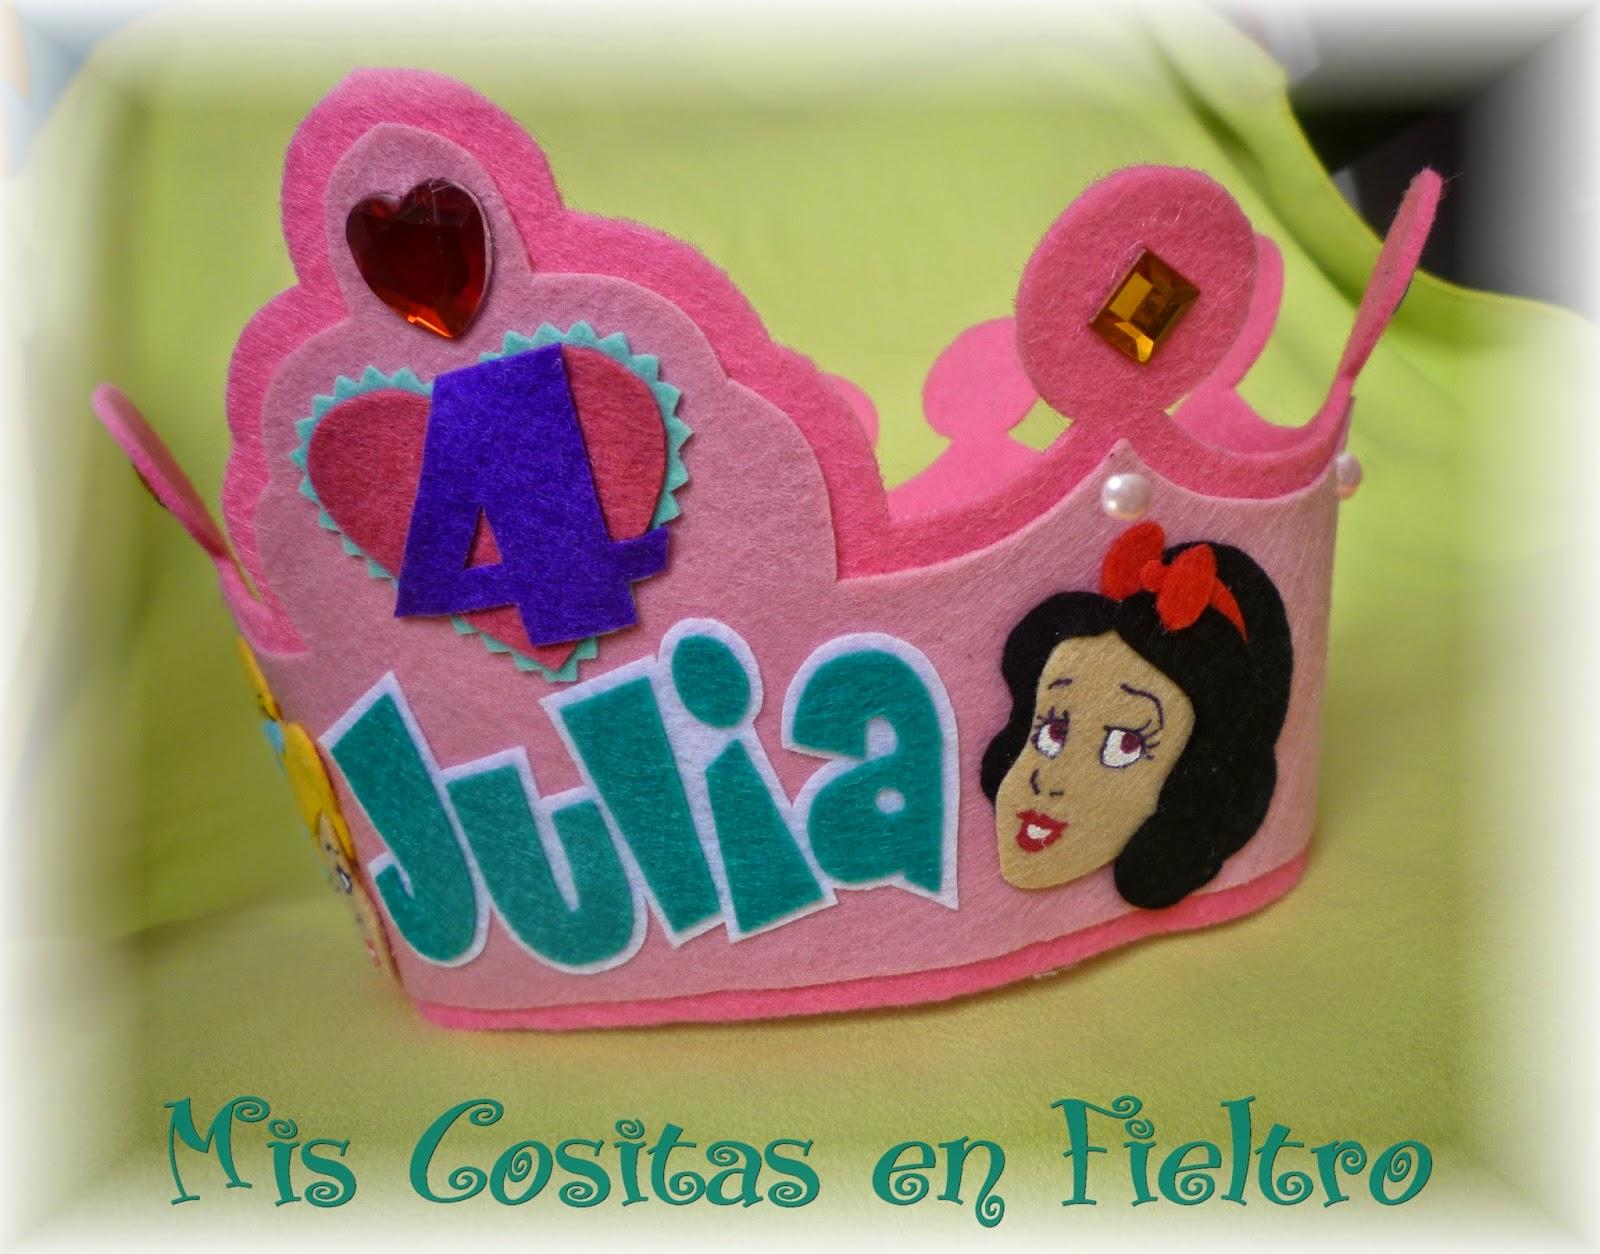 corona, cumple, cumpleaños, birthday party, crown, snowhite, cenicienta, cinderella, blancanieves, blanca nieves, fiesta cumple